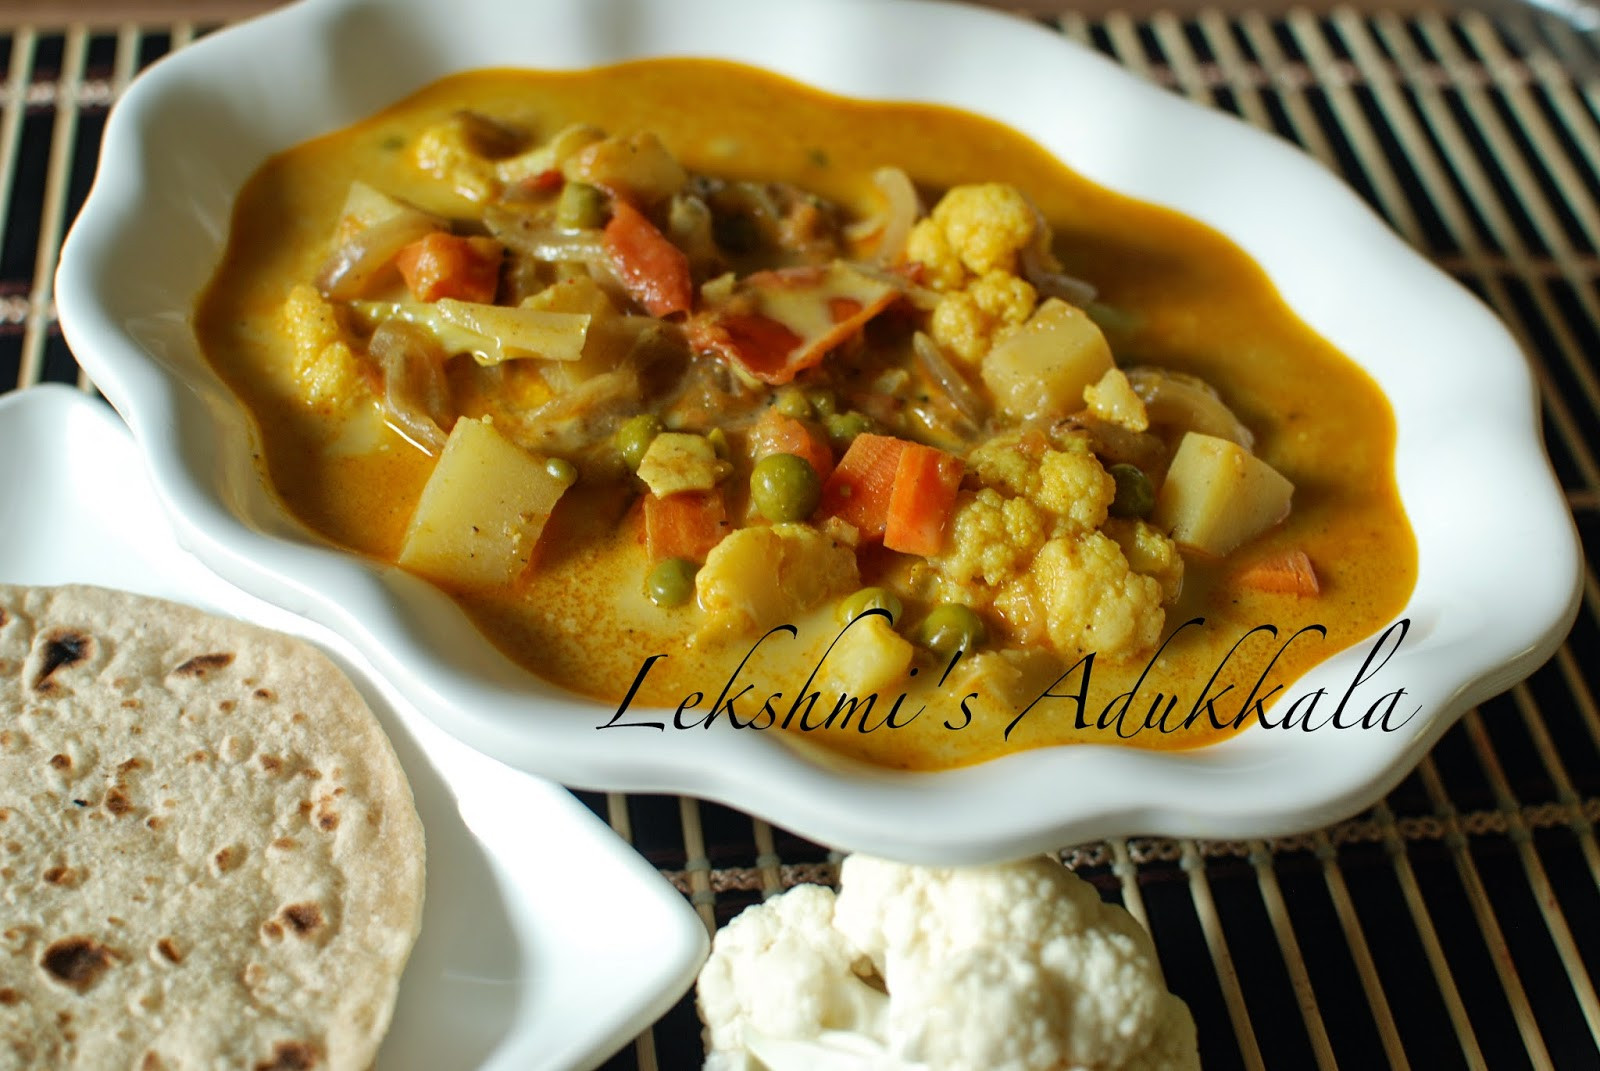 Cauliflower Dietary Fiber  Lekshmi s Adukkala Cauliflower Curry